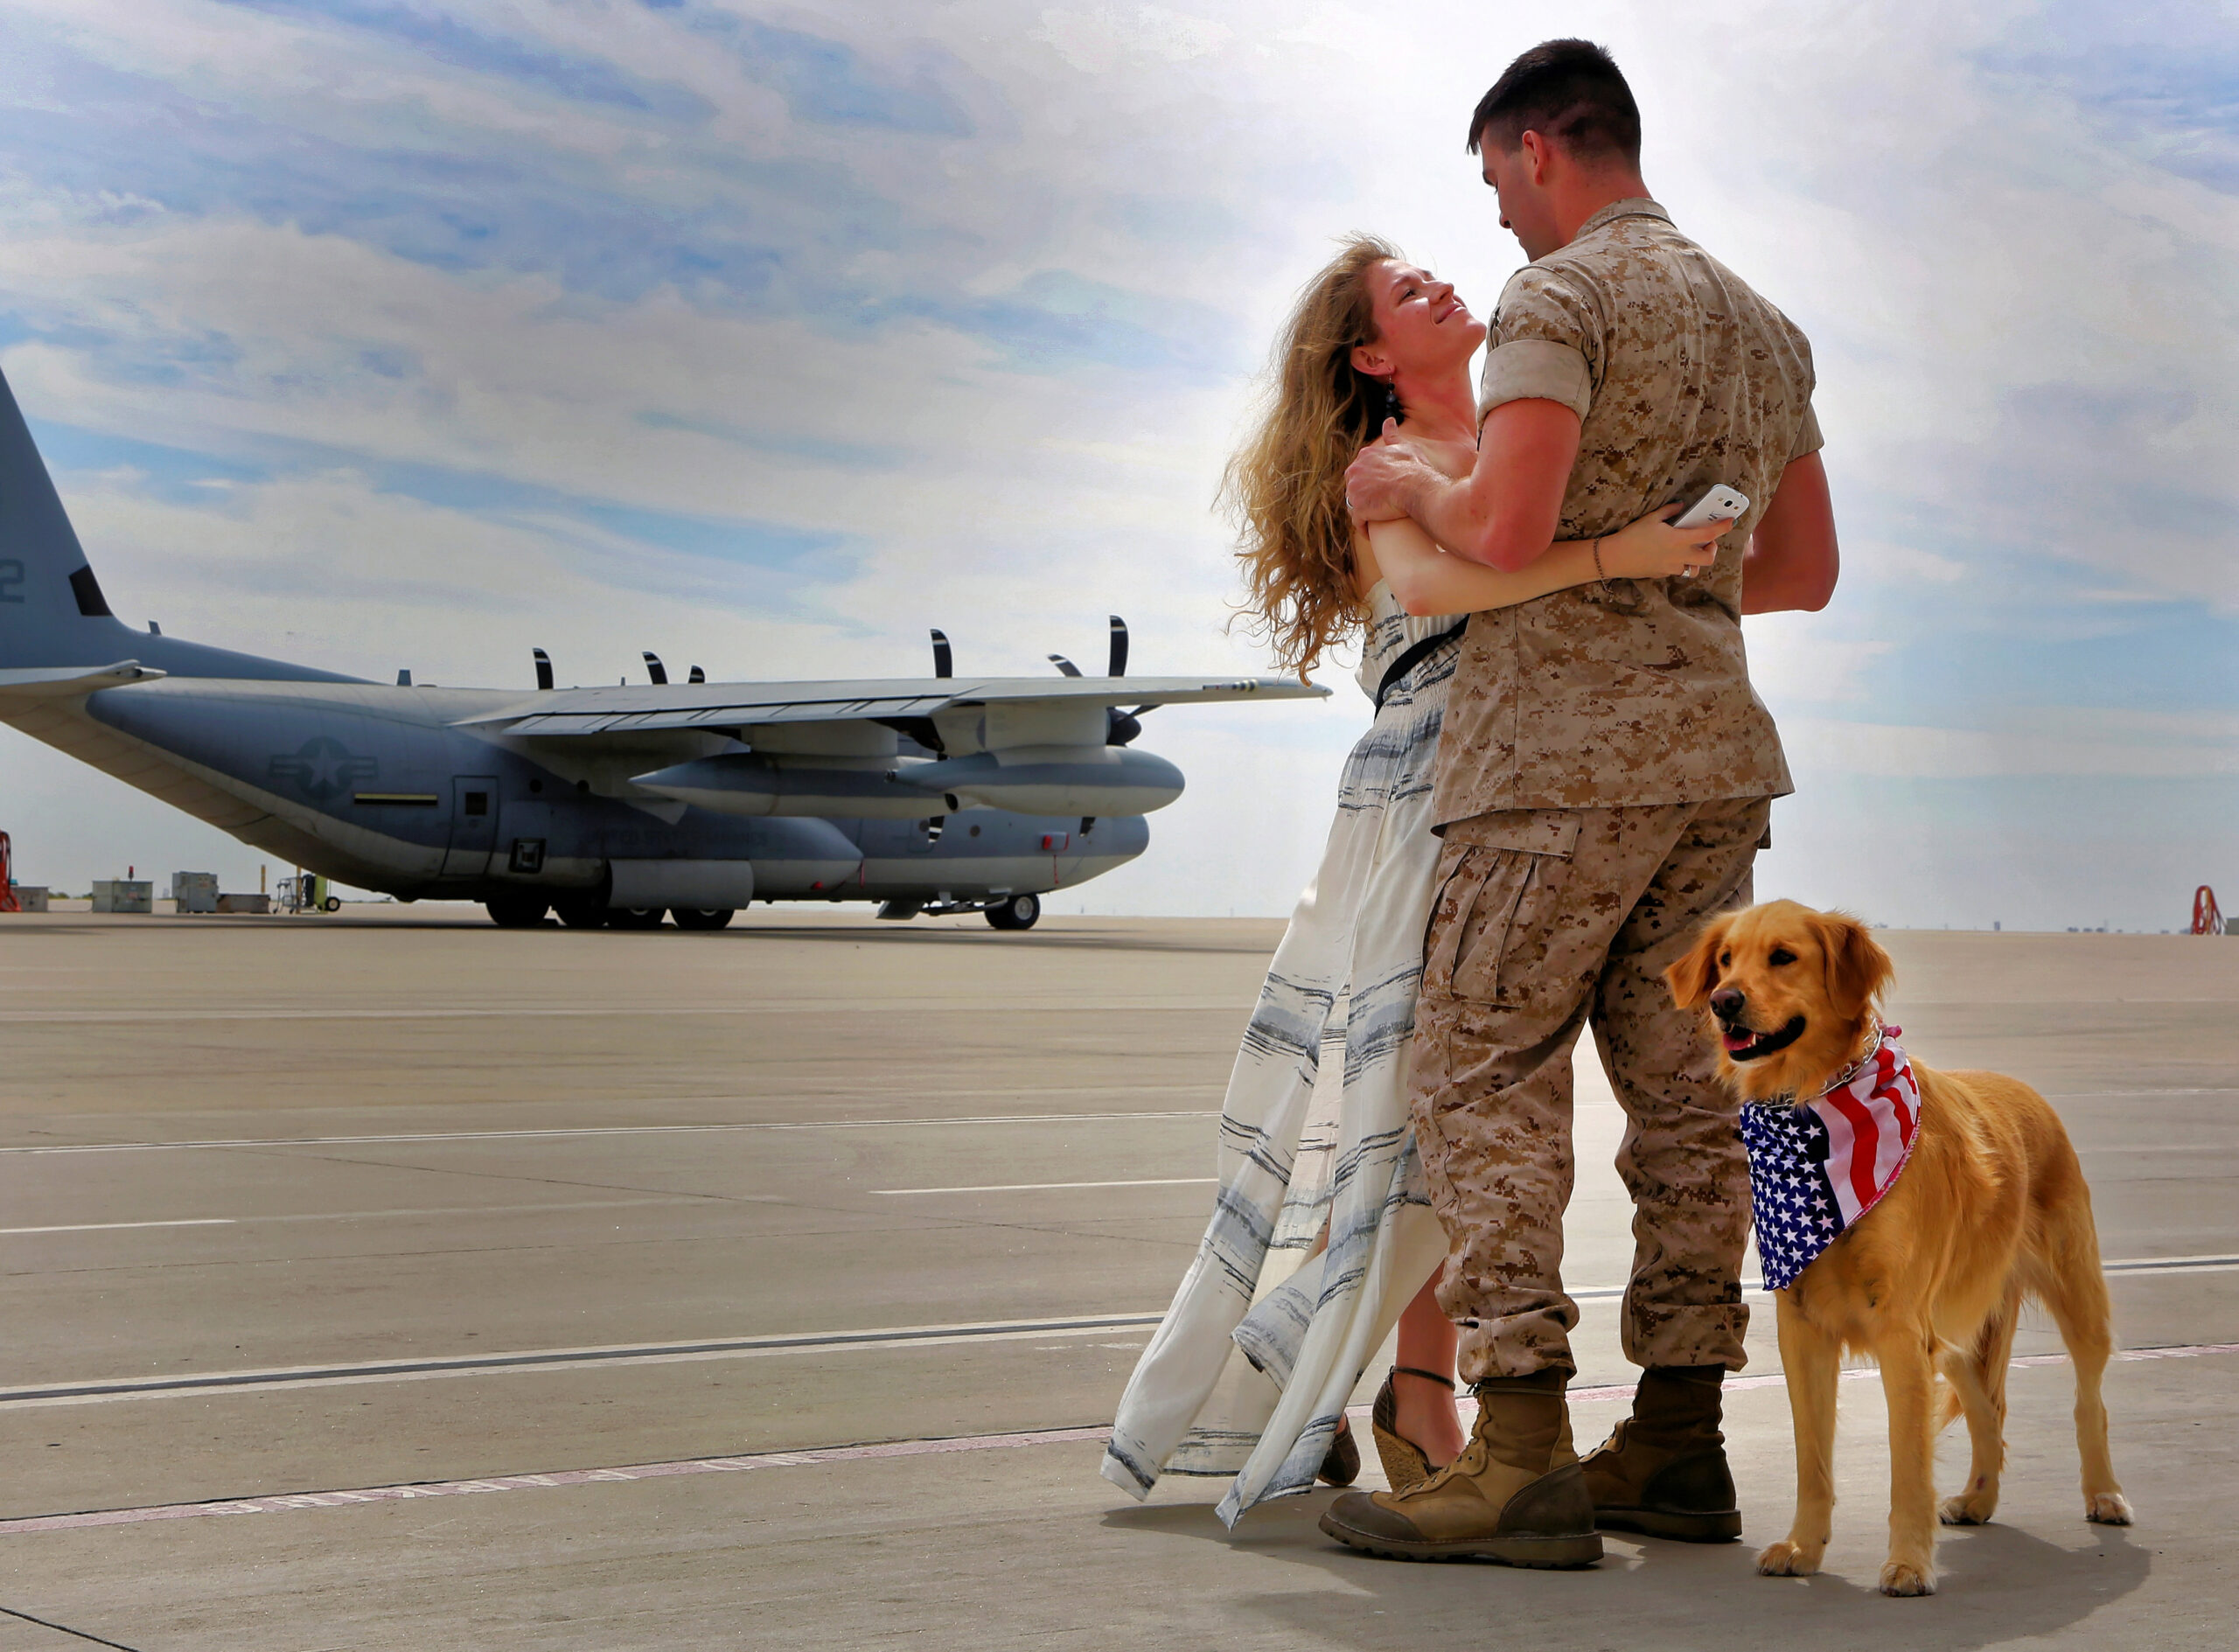 https://i2.wp.com/amortgageforyou.com/wp-content/uploads/Veteran-Coming-Home-scaled.jpg